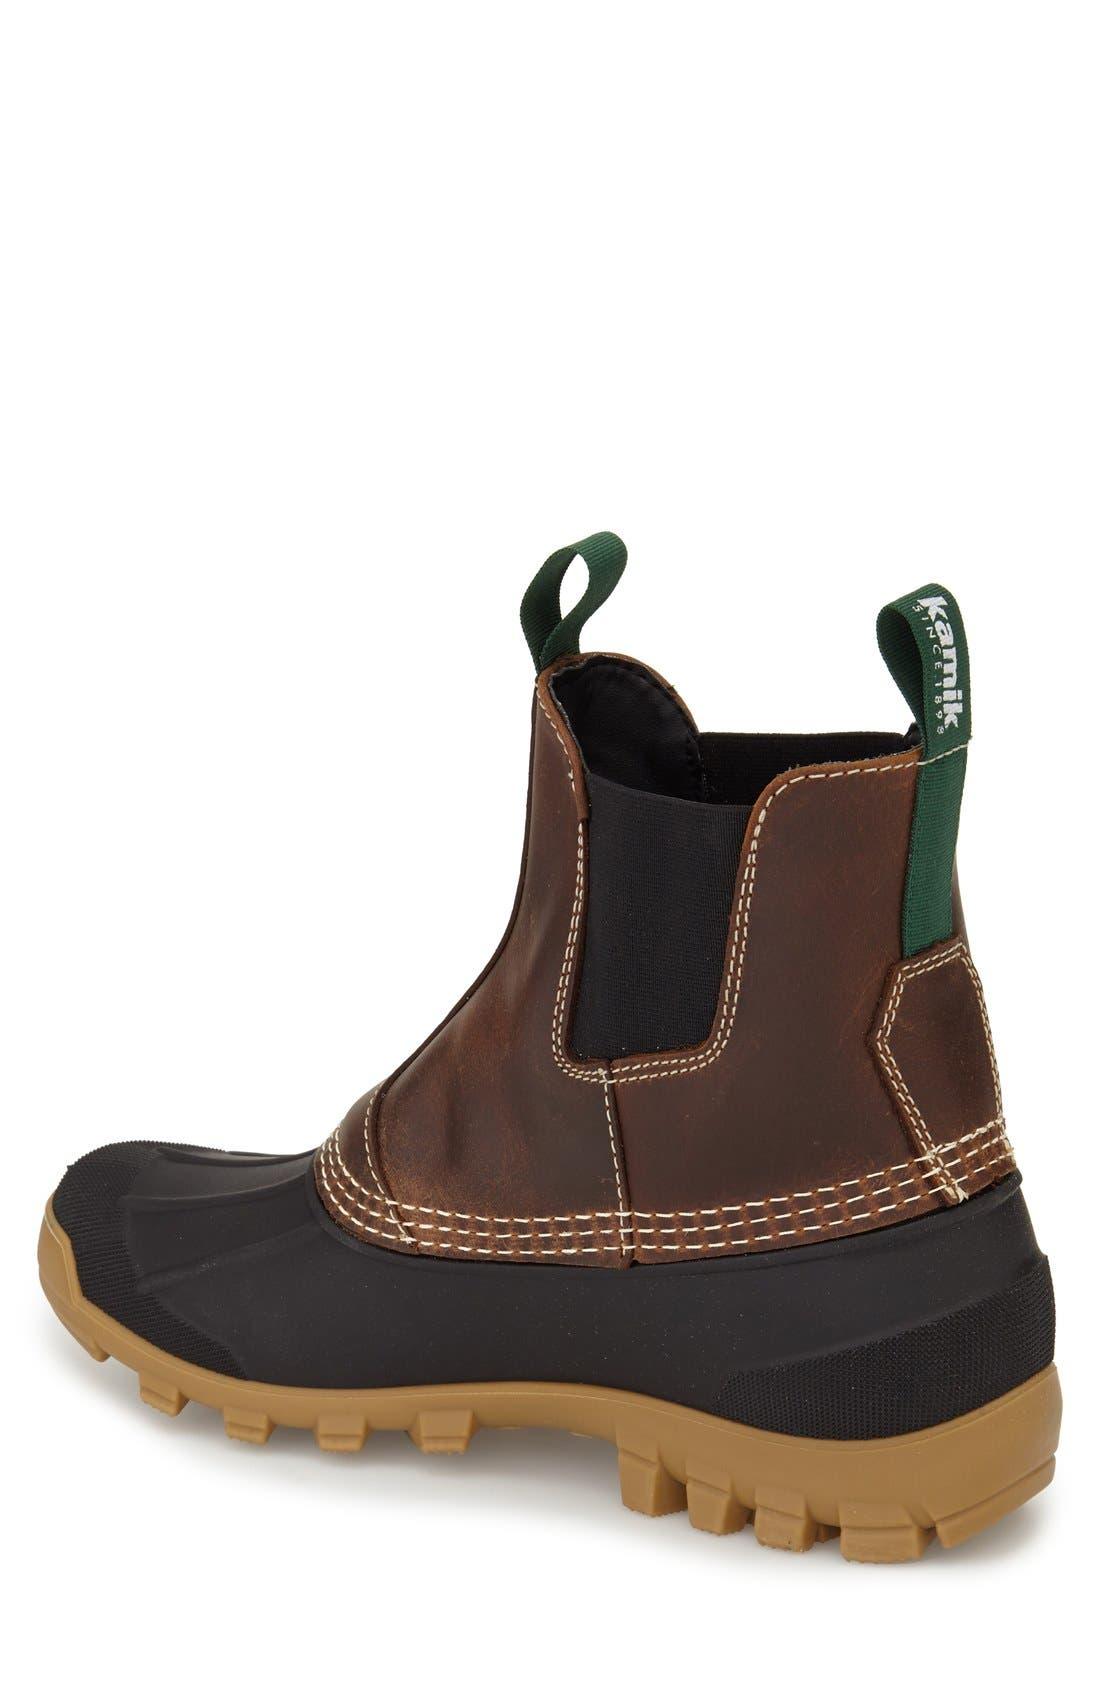 Yukon C Snow Boot,                             Alternate thumbnail 2, color,                             Dark Brown Leather